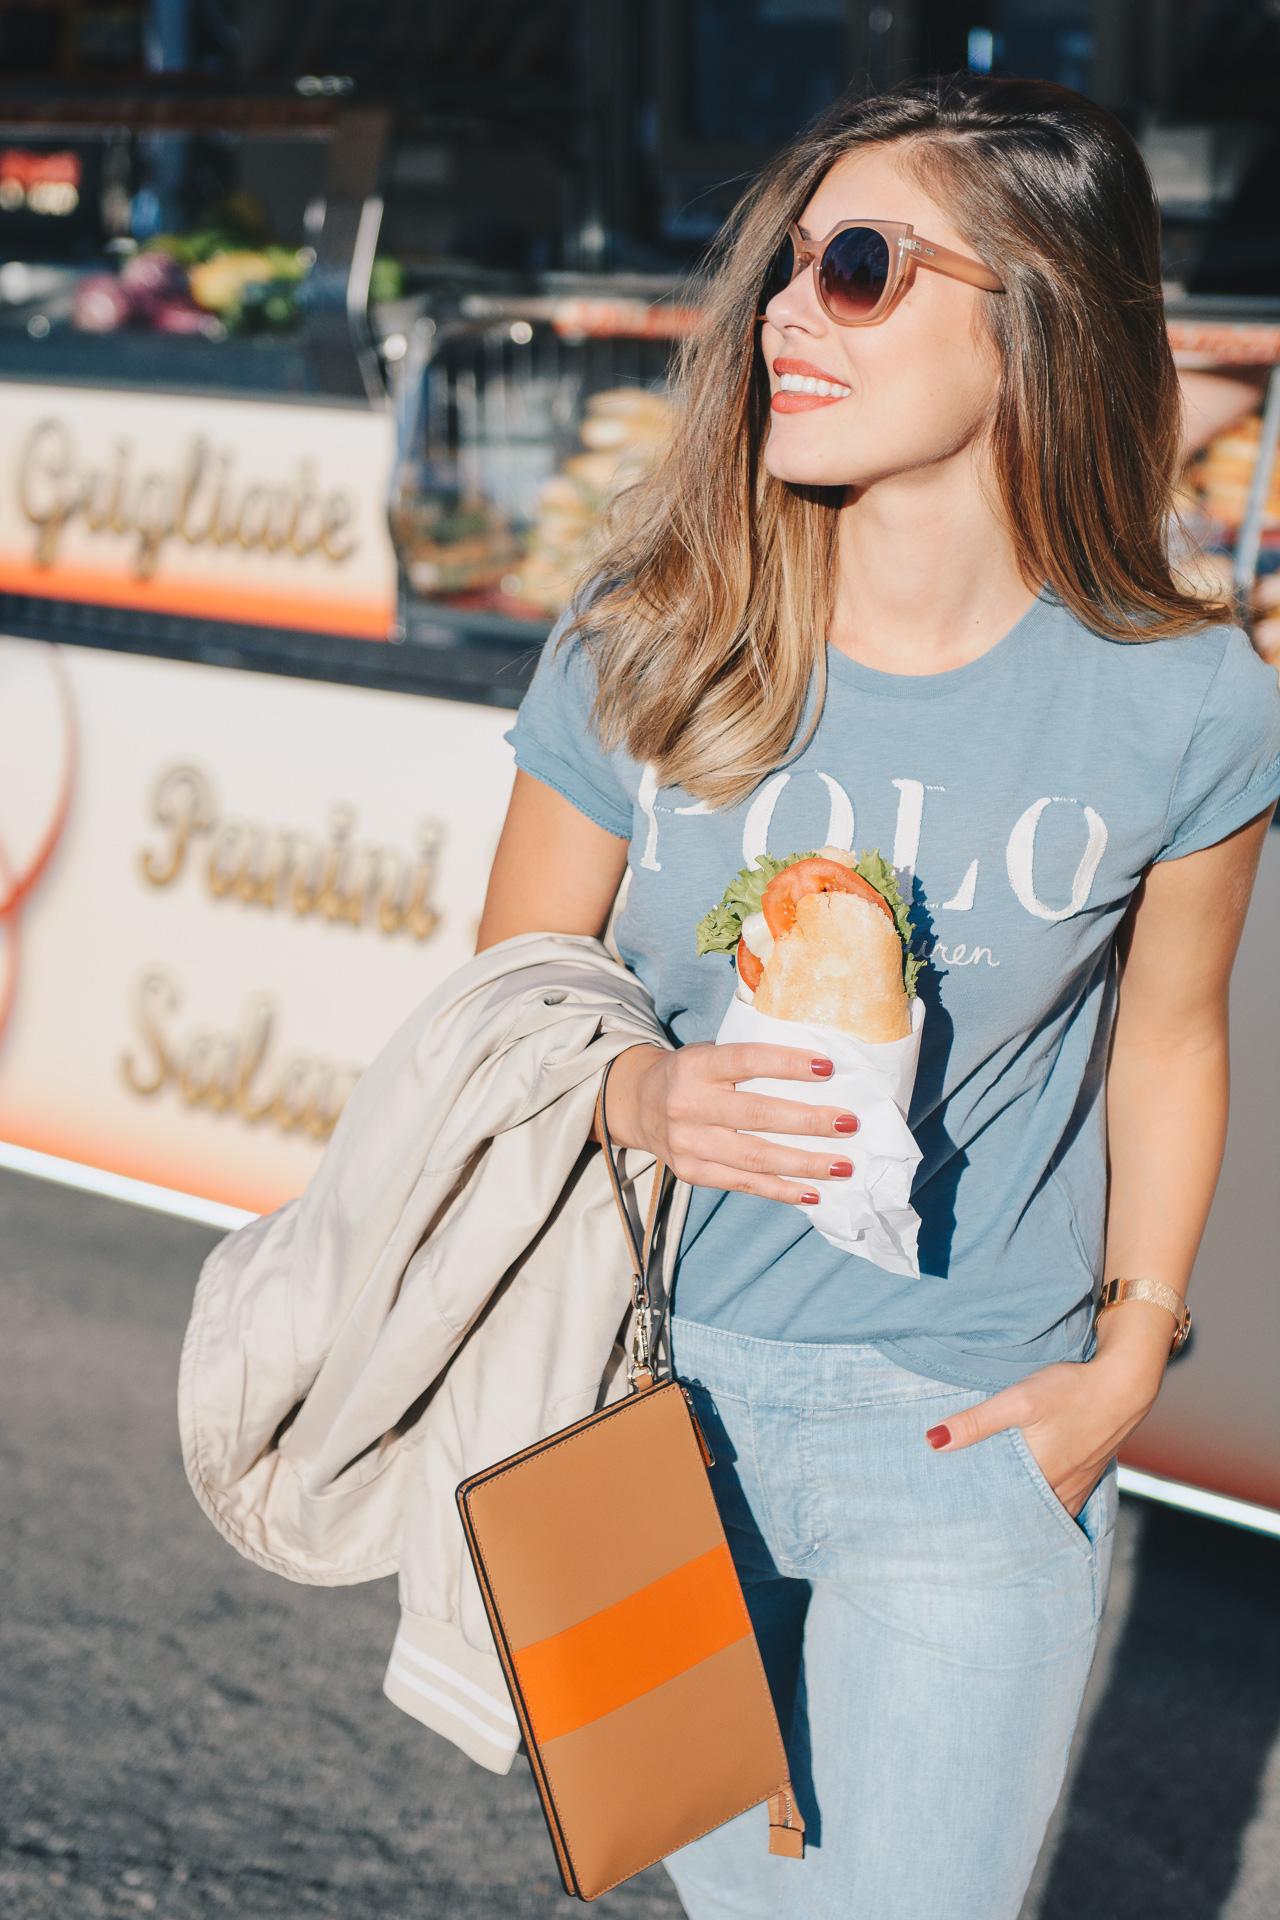 Polo Ralph Lauren fashion blogger